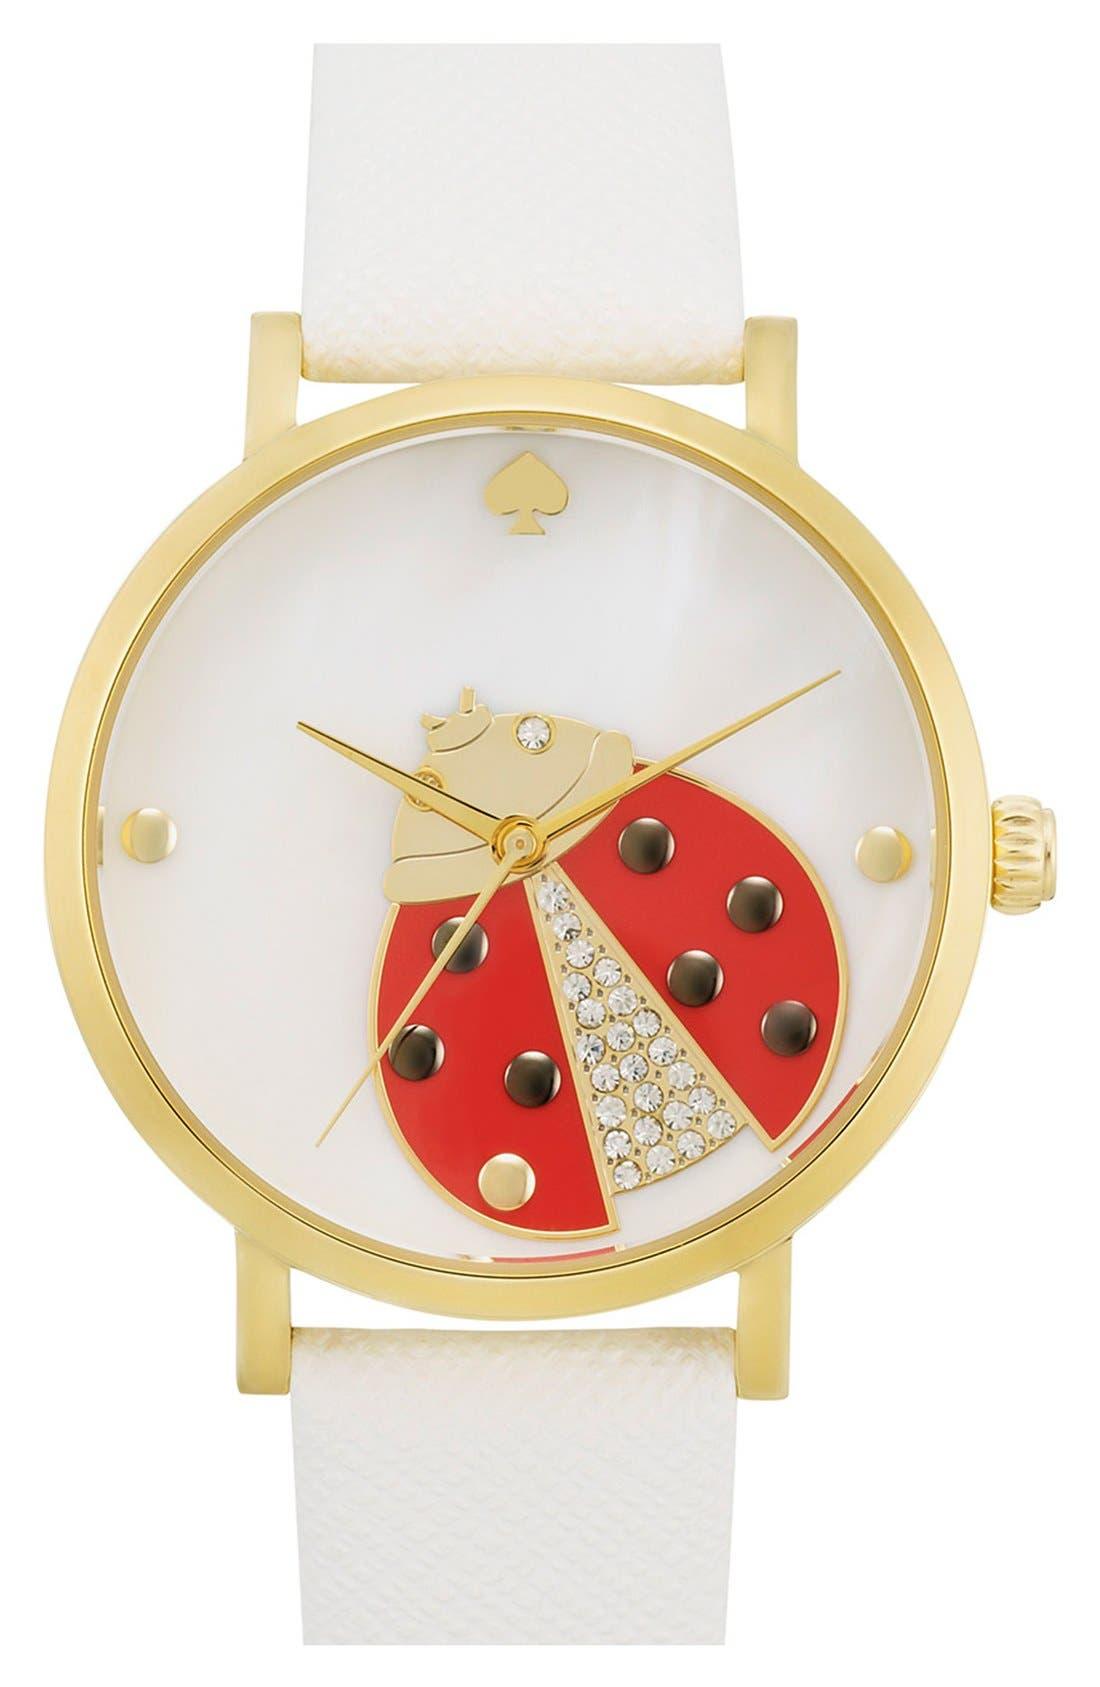 Main Image - kate spade new york 'metro' ladybug dial leather strap watch, 34mm